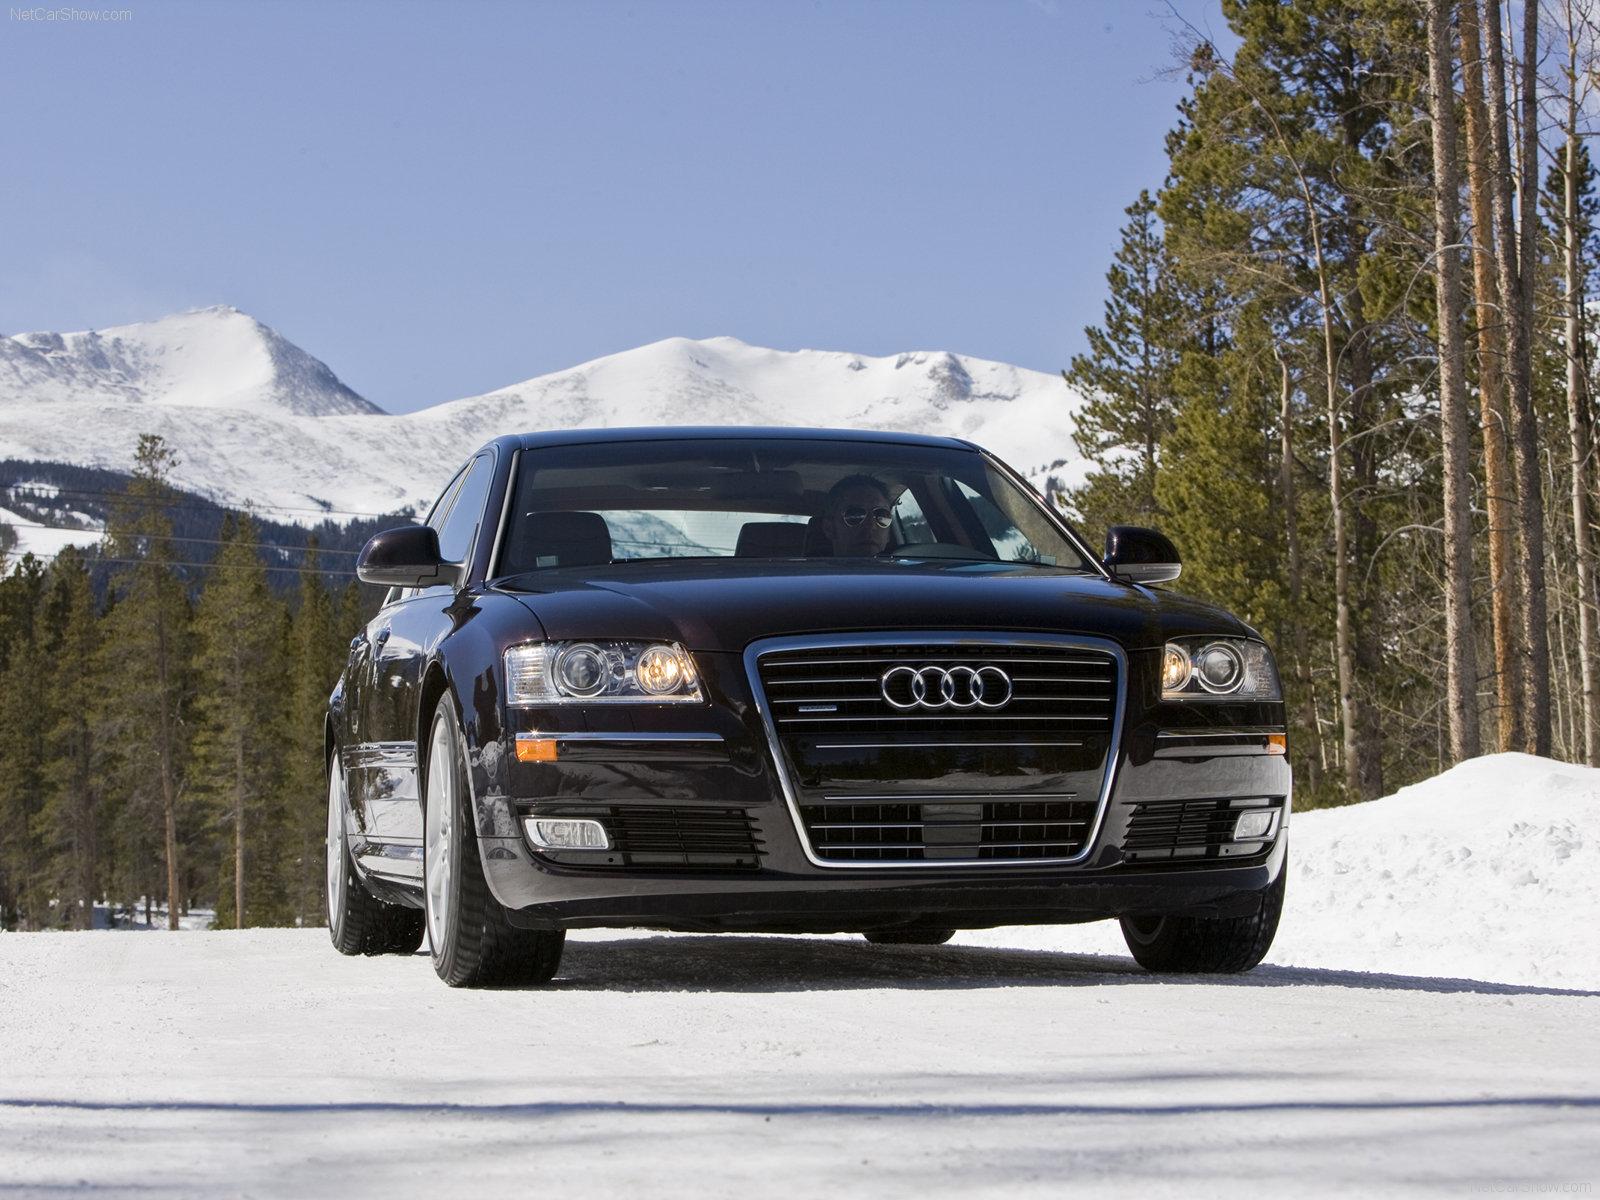 http://3.bp.blogspot.com/-B3UtNAIqy3Y/TXhoKPHYMFI/AAAAAAAAB7Y/ymXwWxraMm8/s1600/Audi-A8-wallpaper-14.jpg